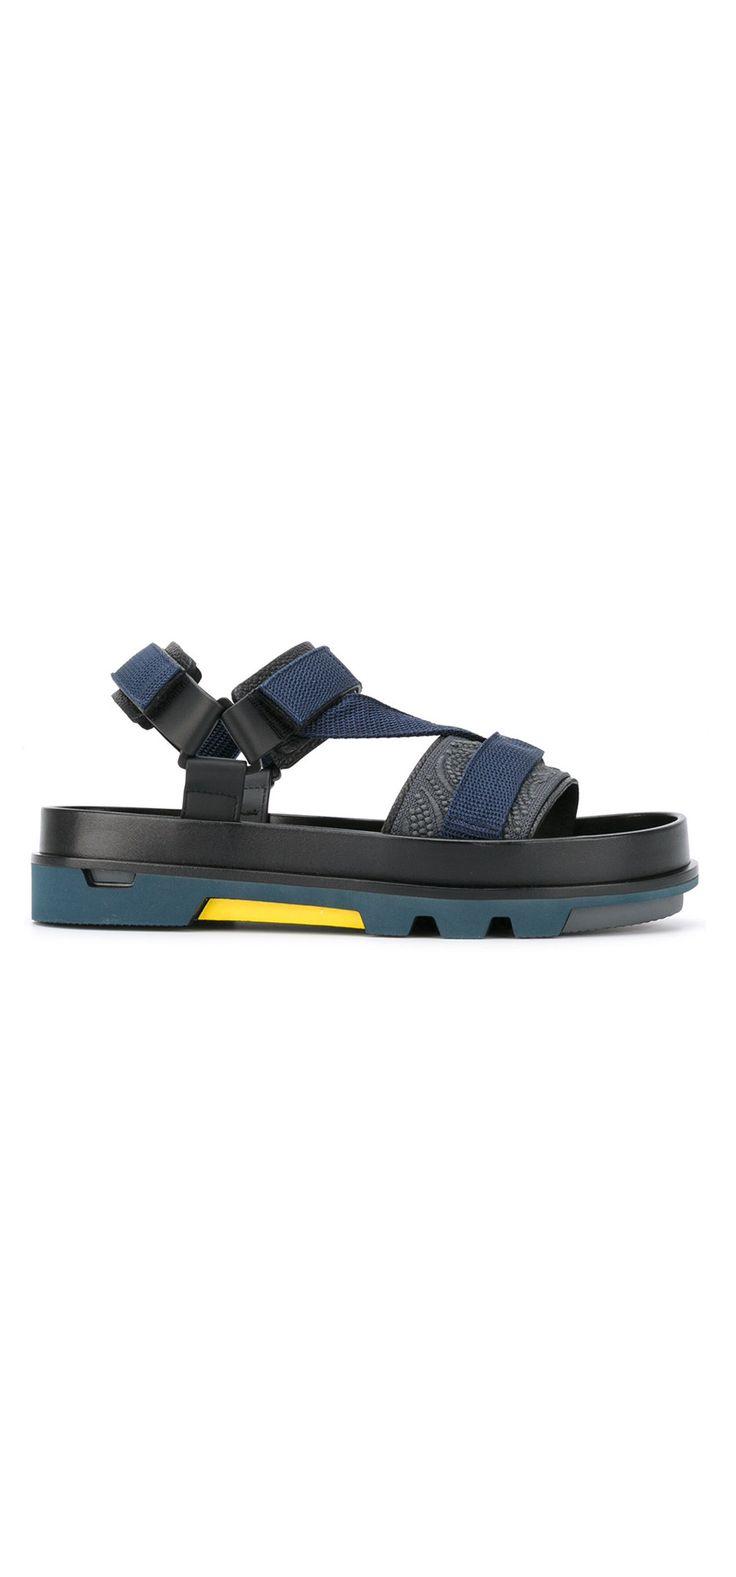 EMPORIO ARMANI chunky sole sandals, explore new season shoes on Farfetch.